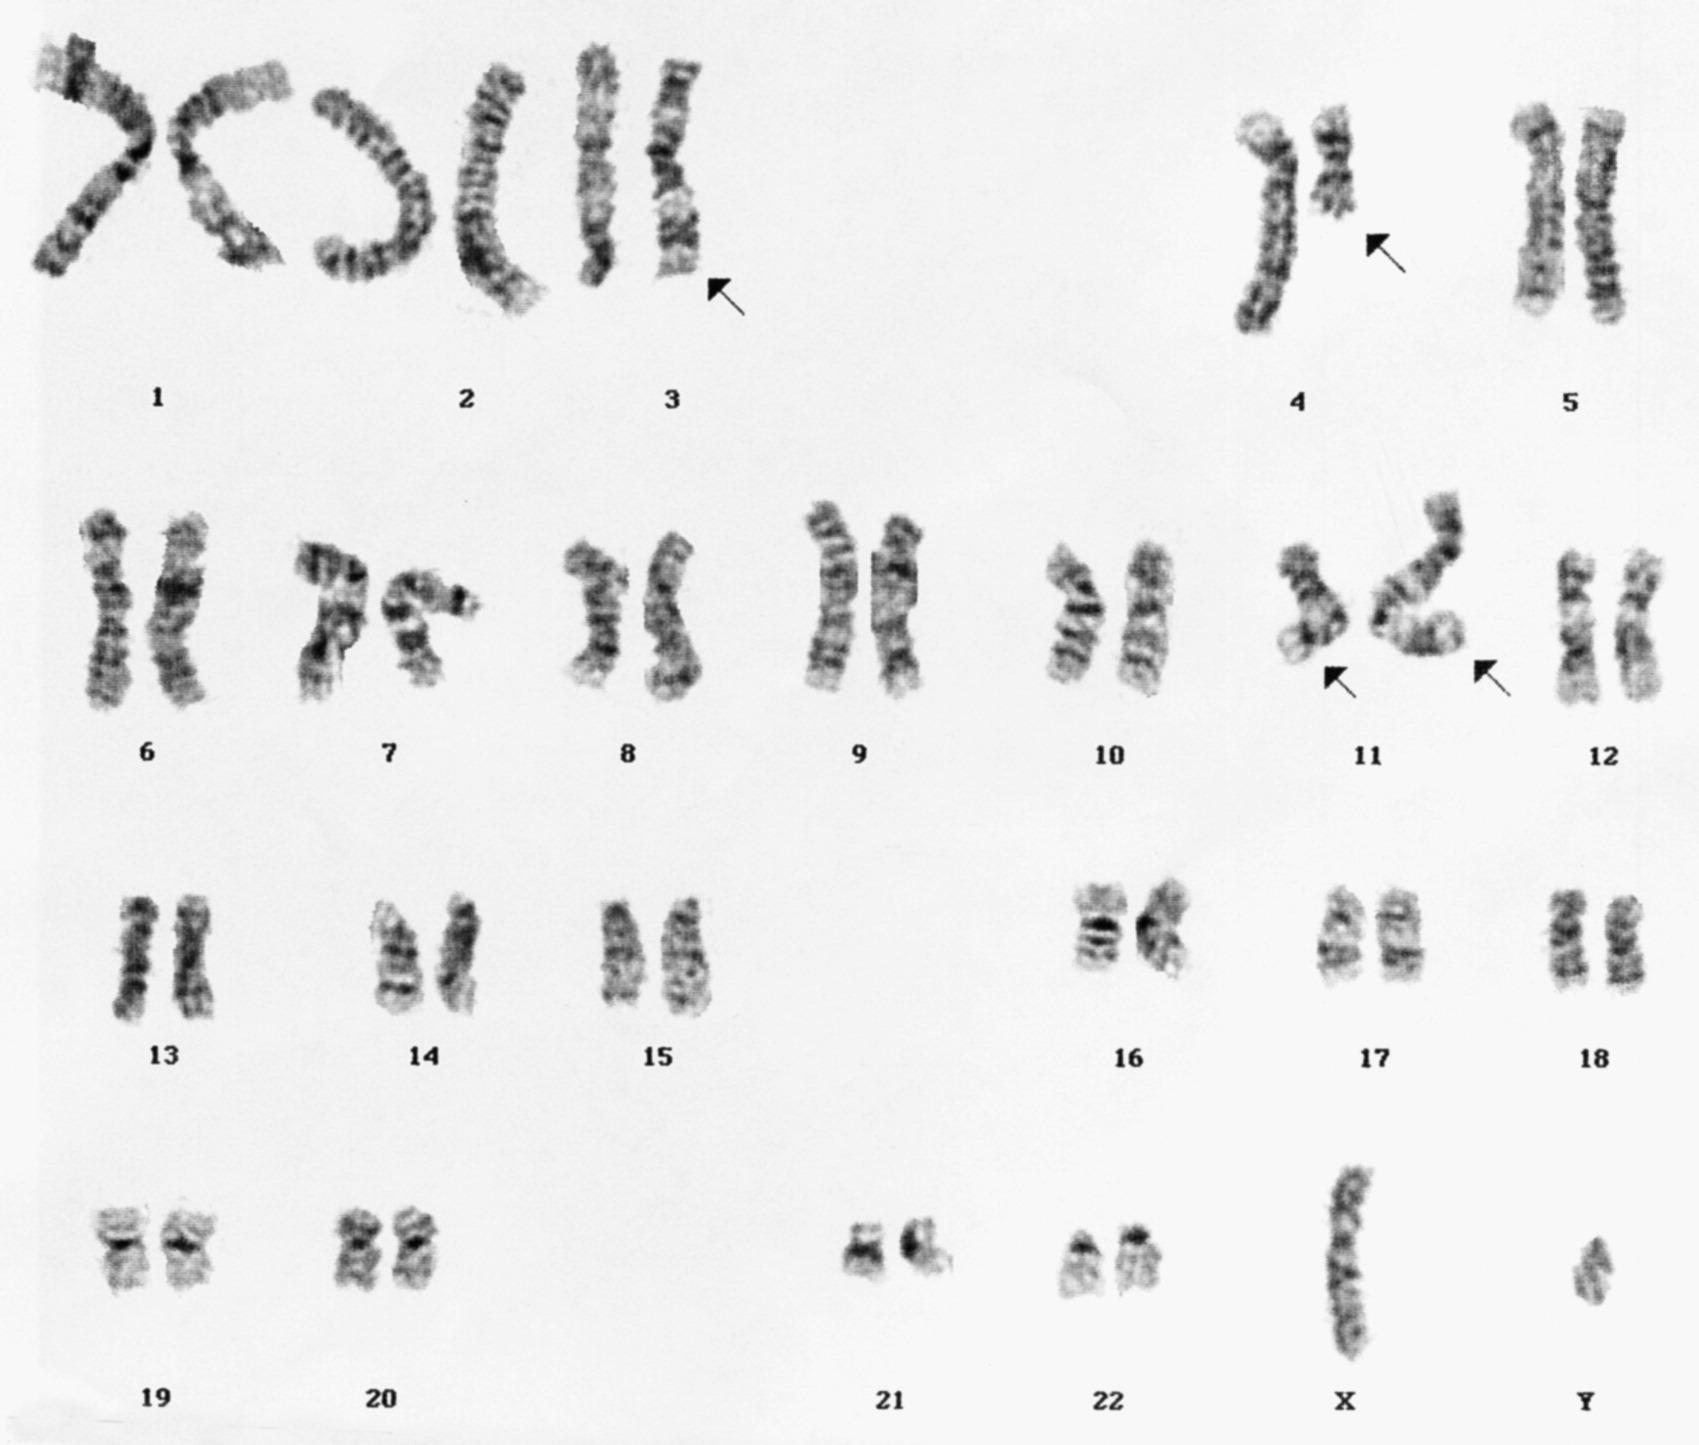 A T 4 11 Q21 P15 In A Case Of T Cell Lymphoma And A Case